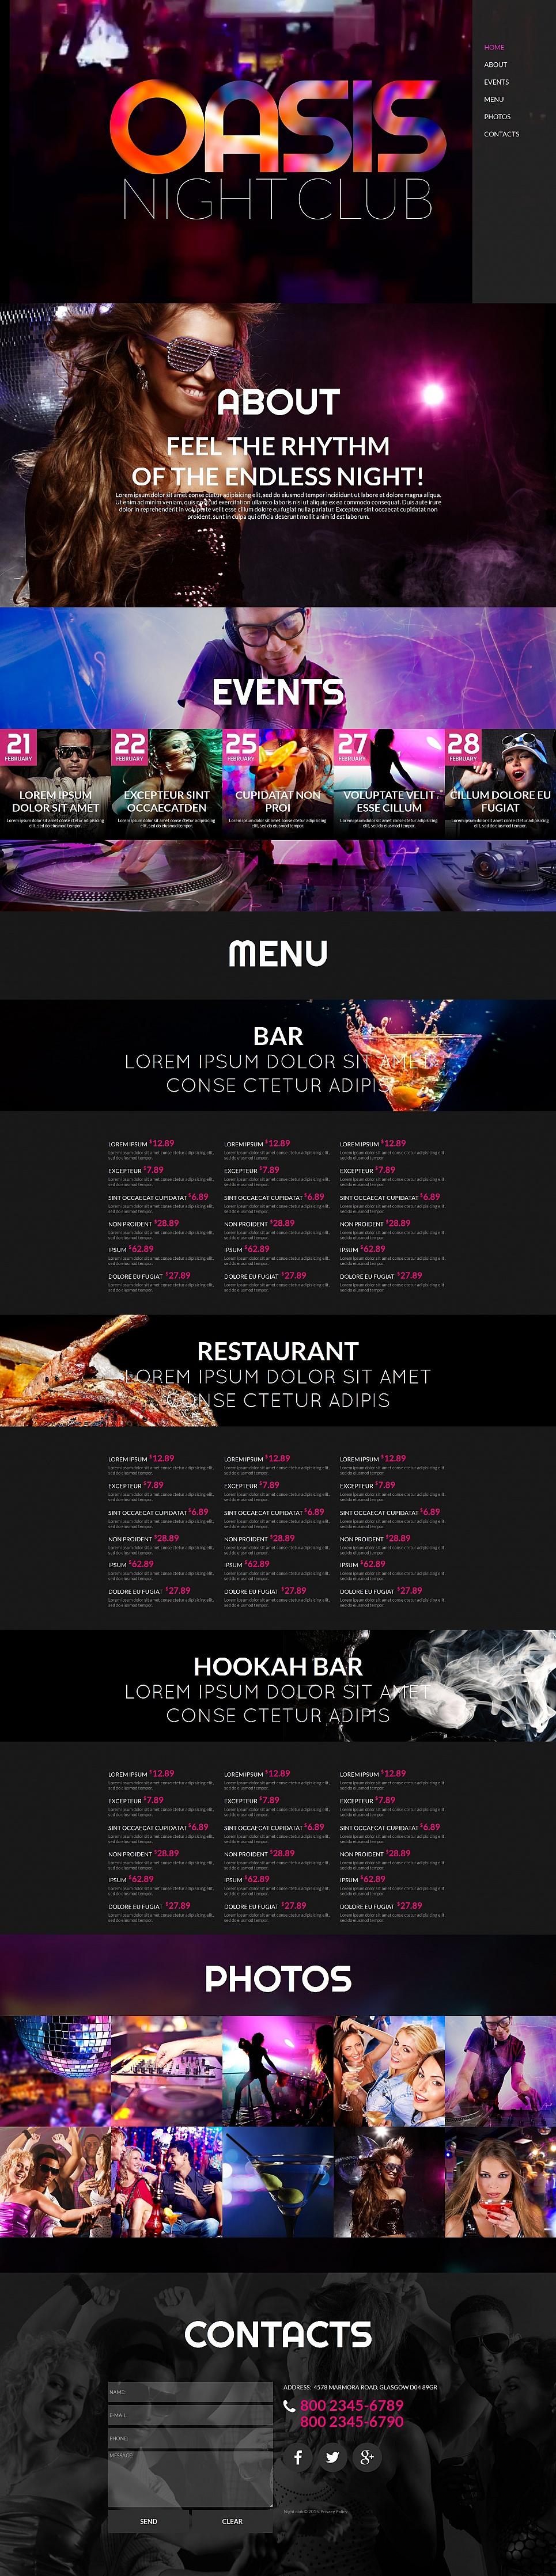 Oasis HTML Website Template - image